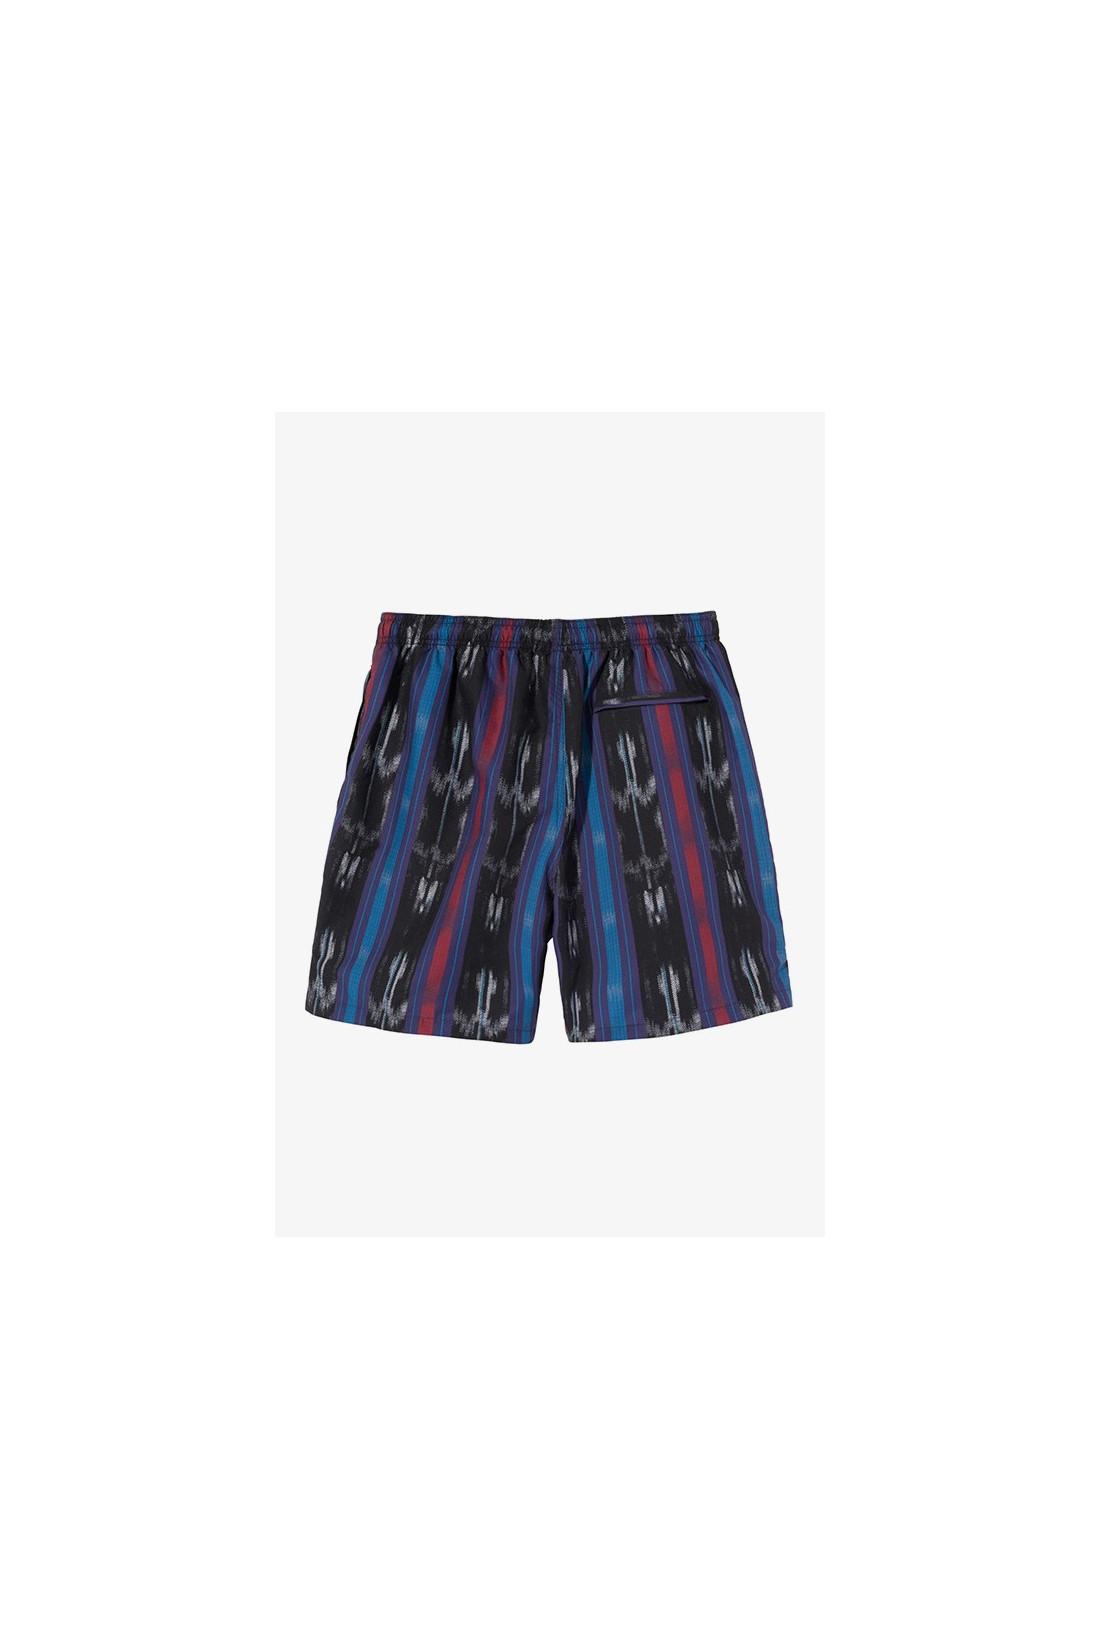 STUSSY / Ikat stripe water short Black